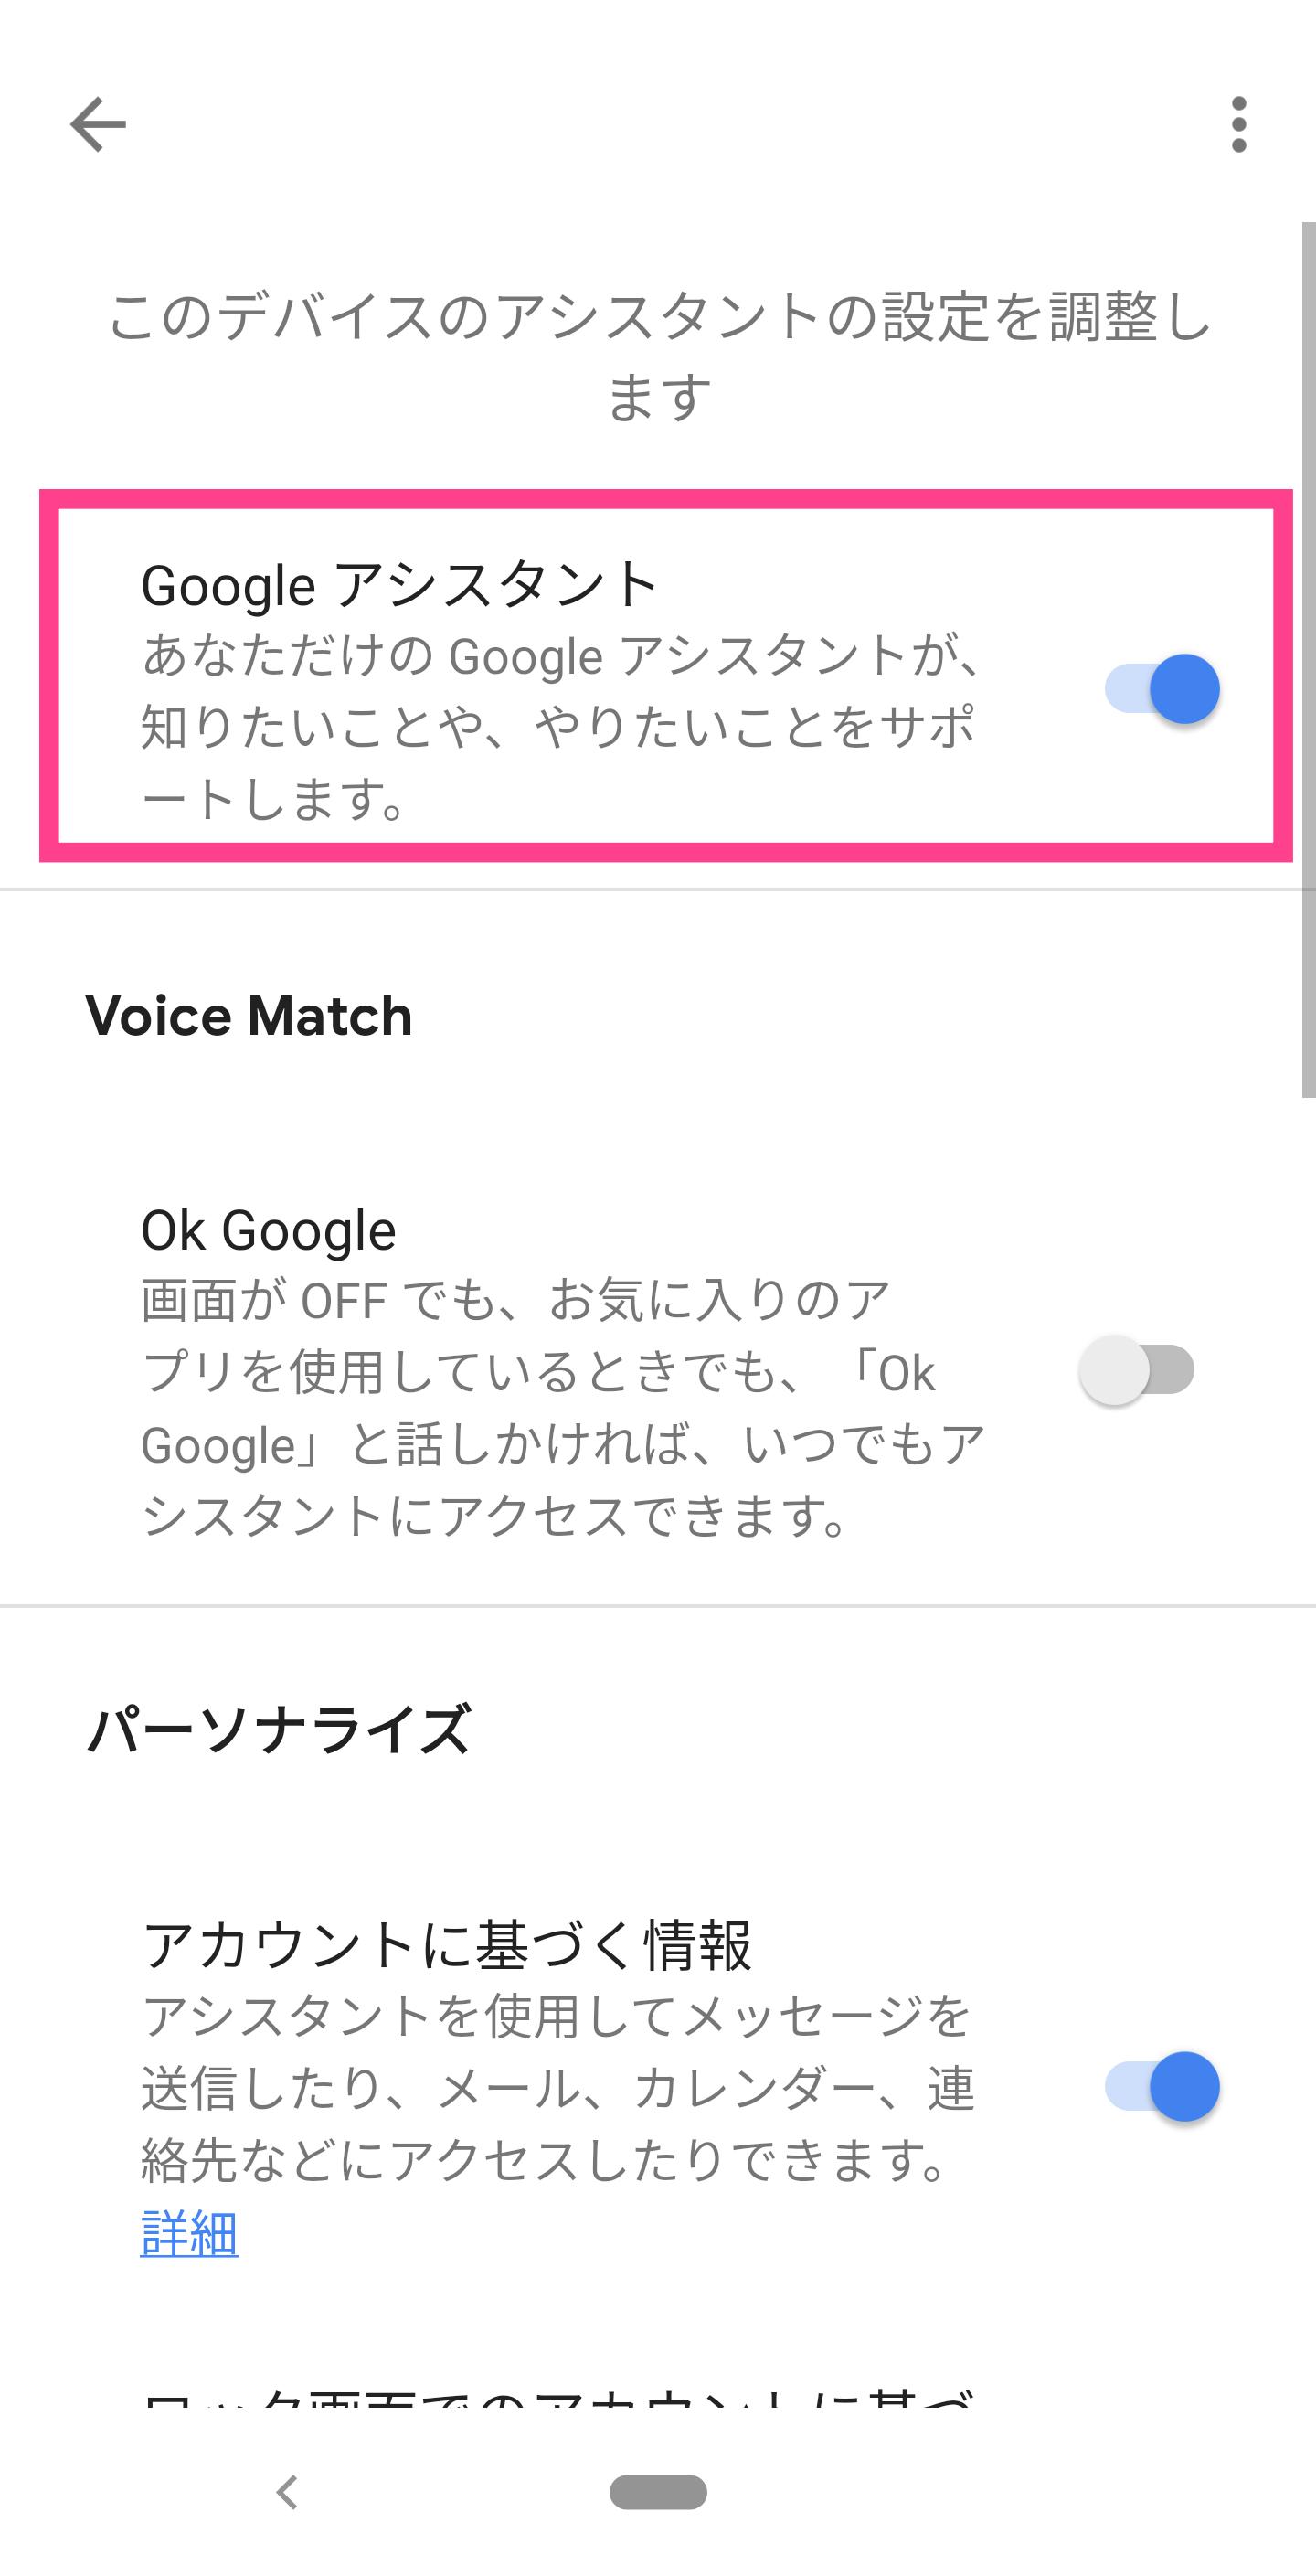 Android-Googleアシスタント有効化